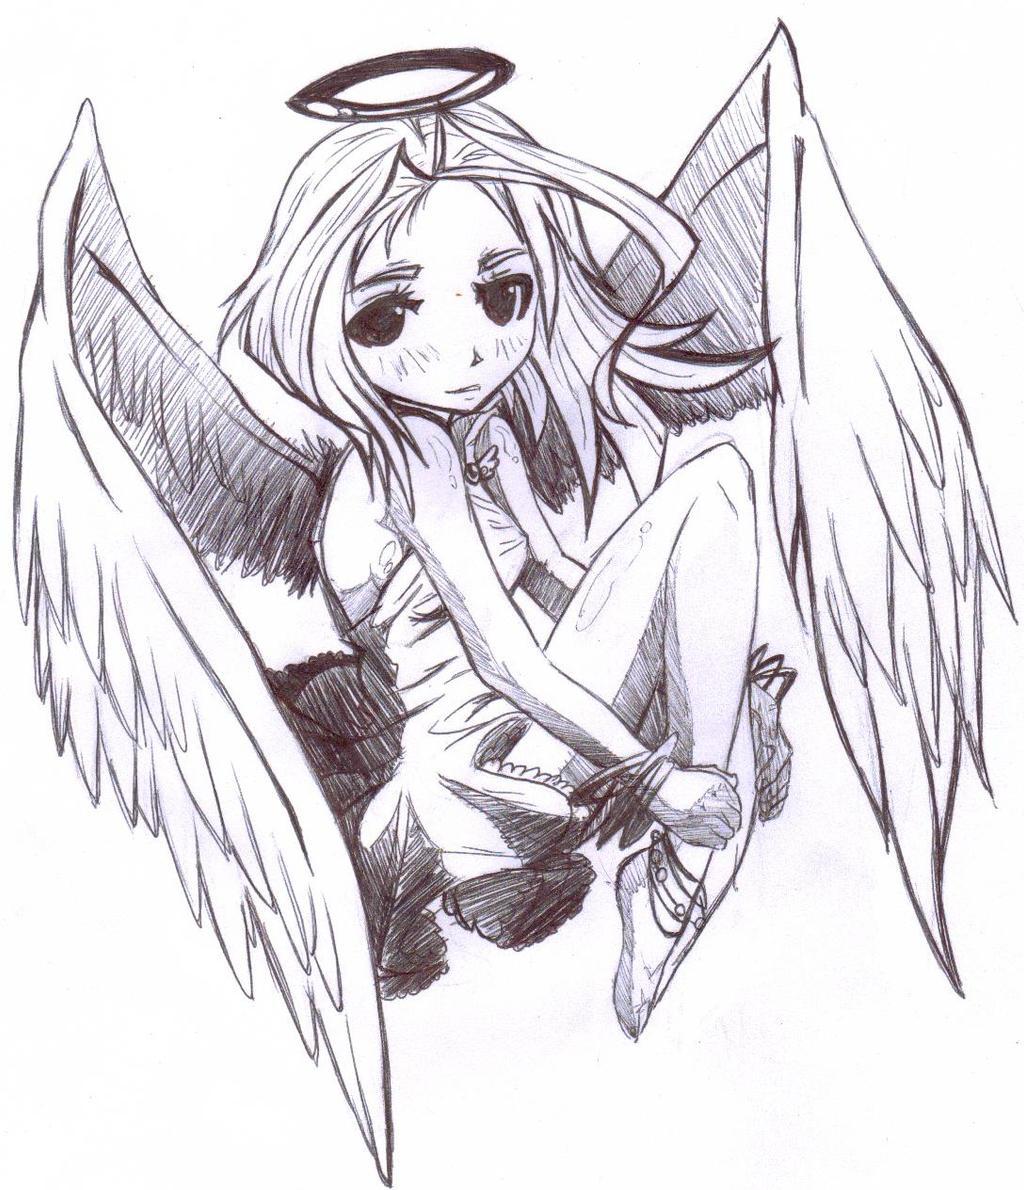 100+ ideas Dibujos De Anime De Angeles on christmashappynewyears ...